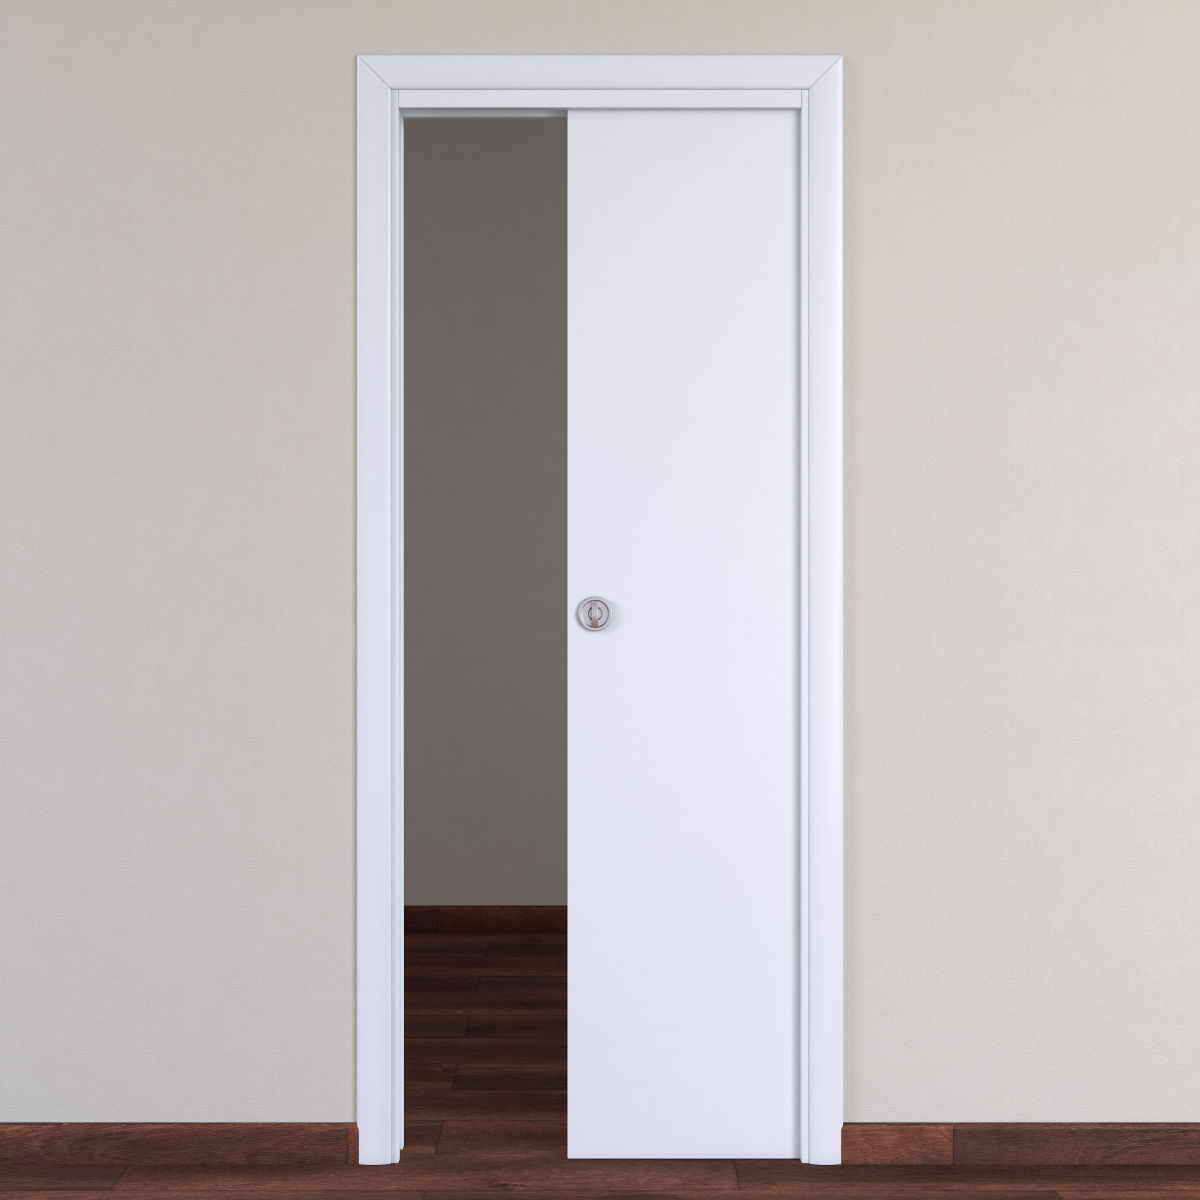 Emejing porta scorrevole bianca contemporary - Porte filo muro leroy merlin ...